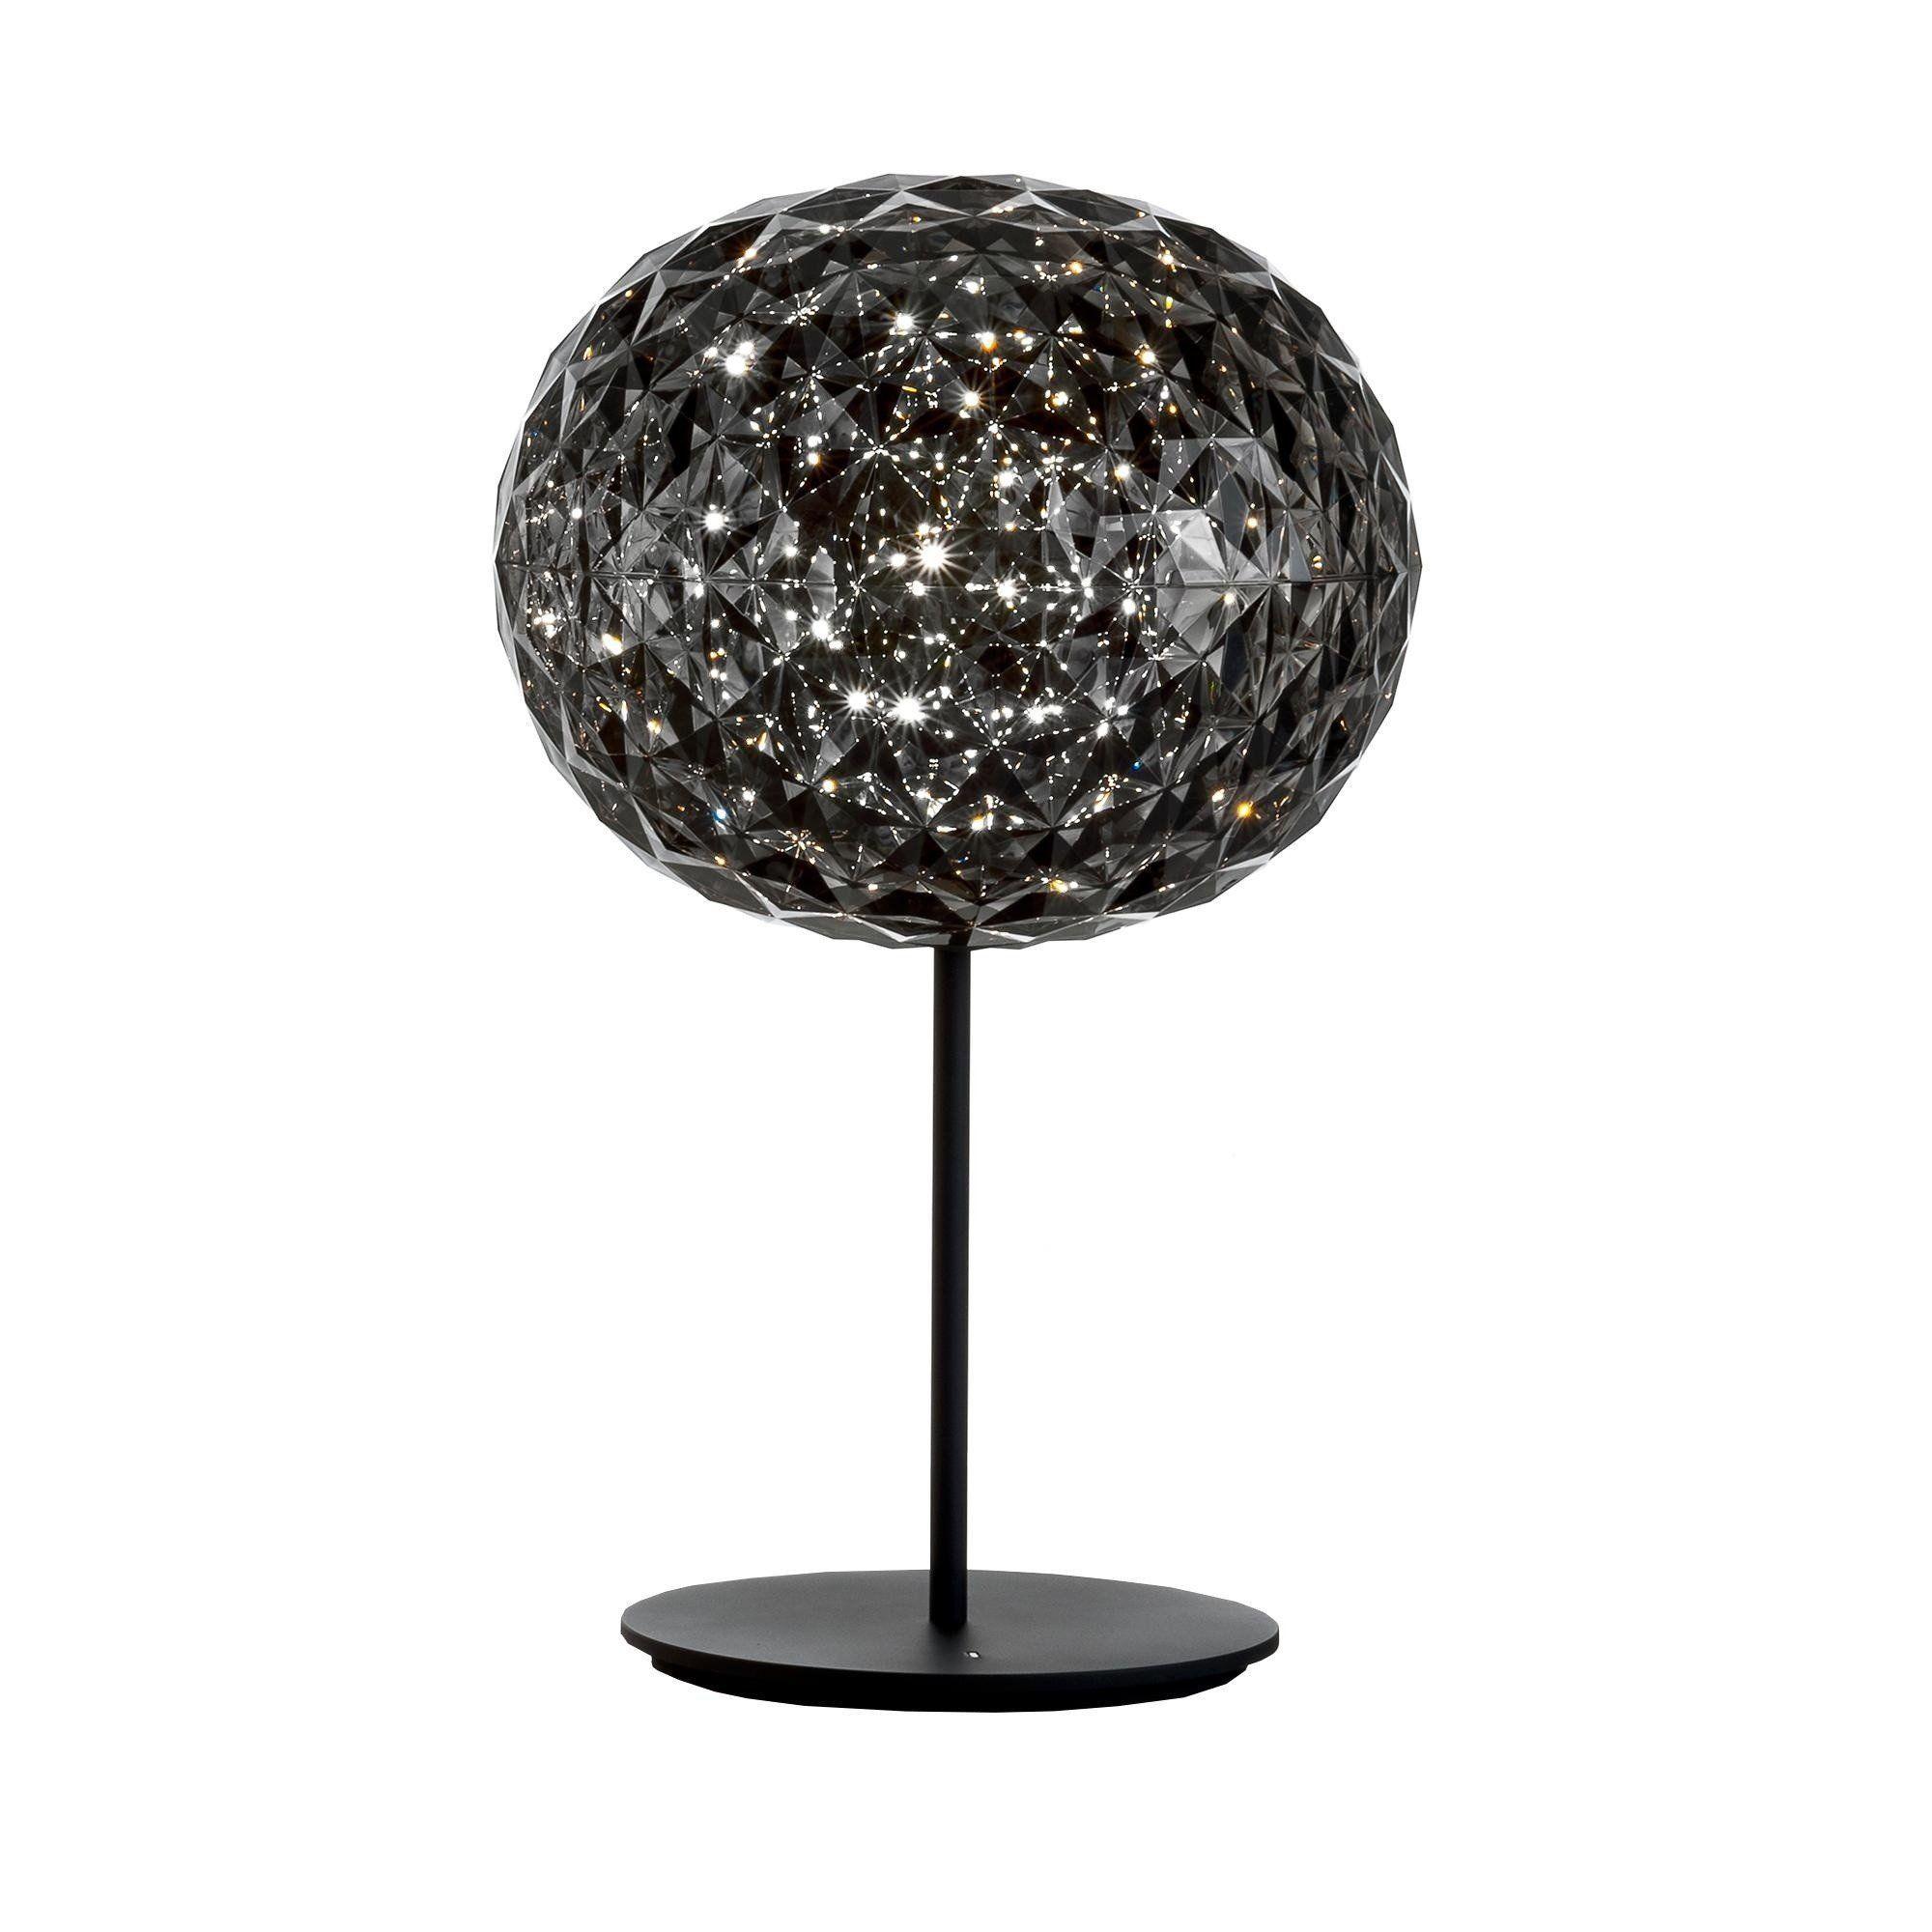 planet lampe de table led avec pied 33cm kartell. Black Bedroom Furniture Sets. Home Design Ideas